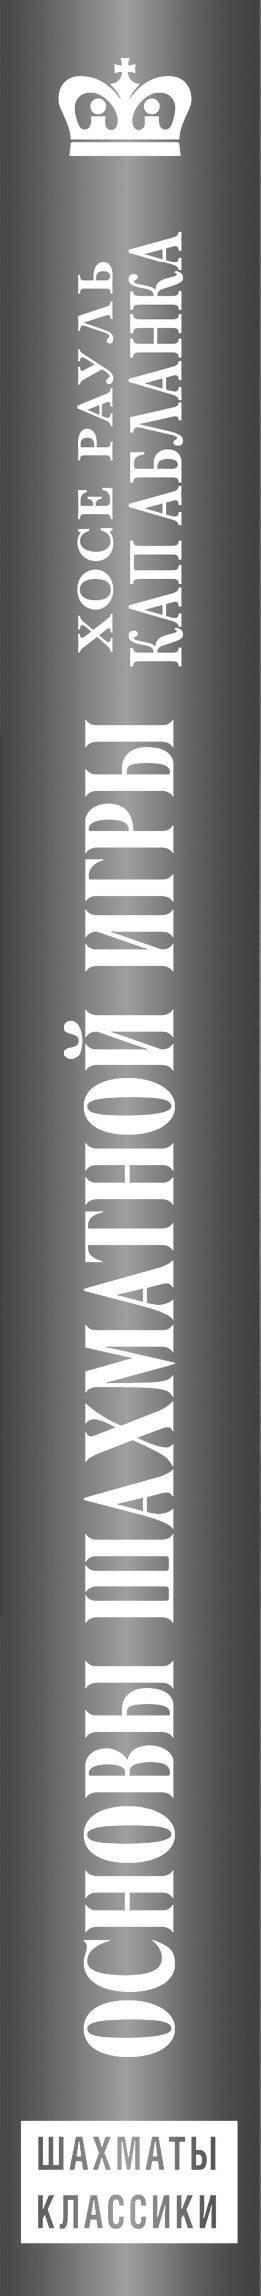 "21.5"" Моноблок ASUS Vivo AiO V222UAK-WA017D (90PT0262-M04570), белый"